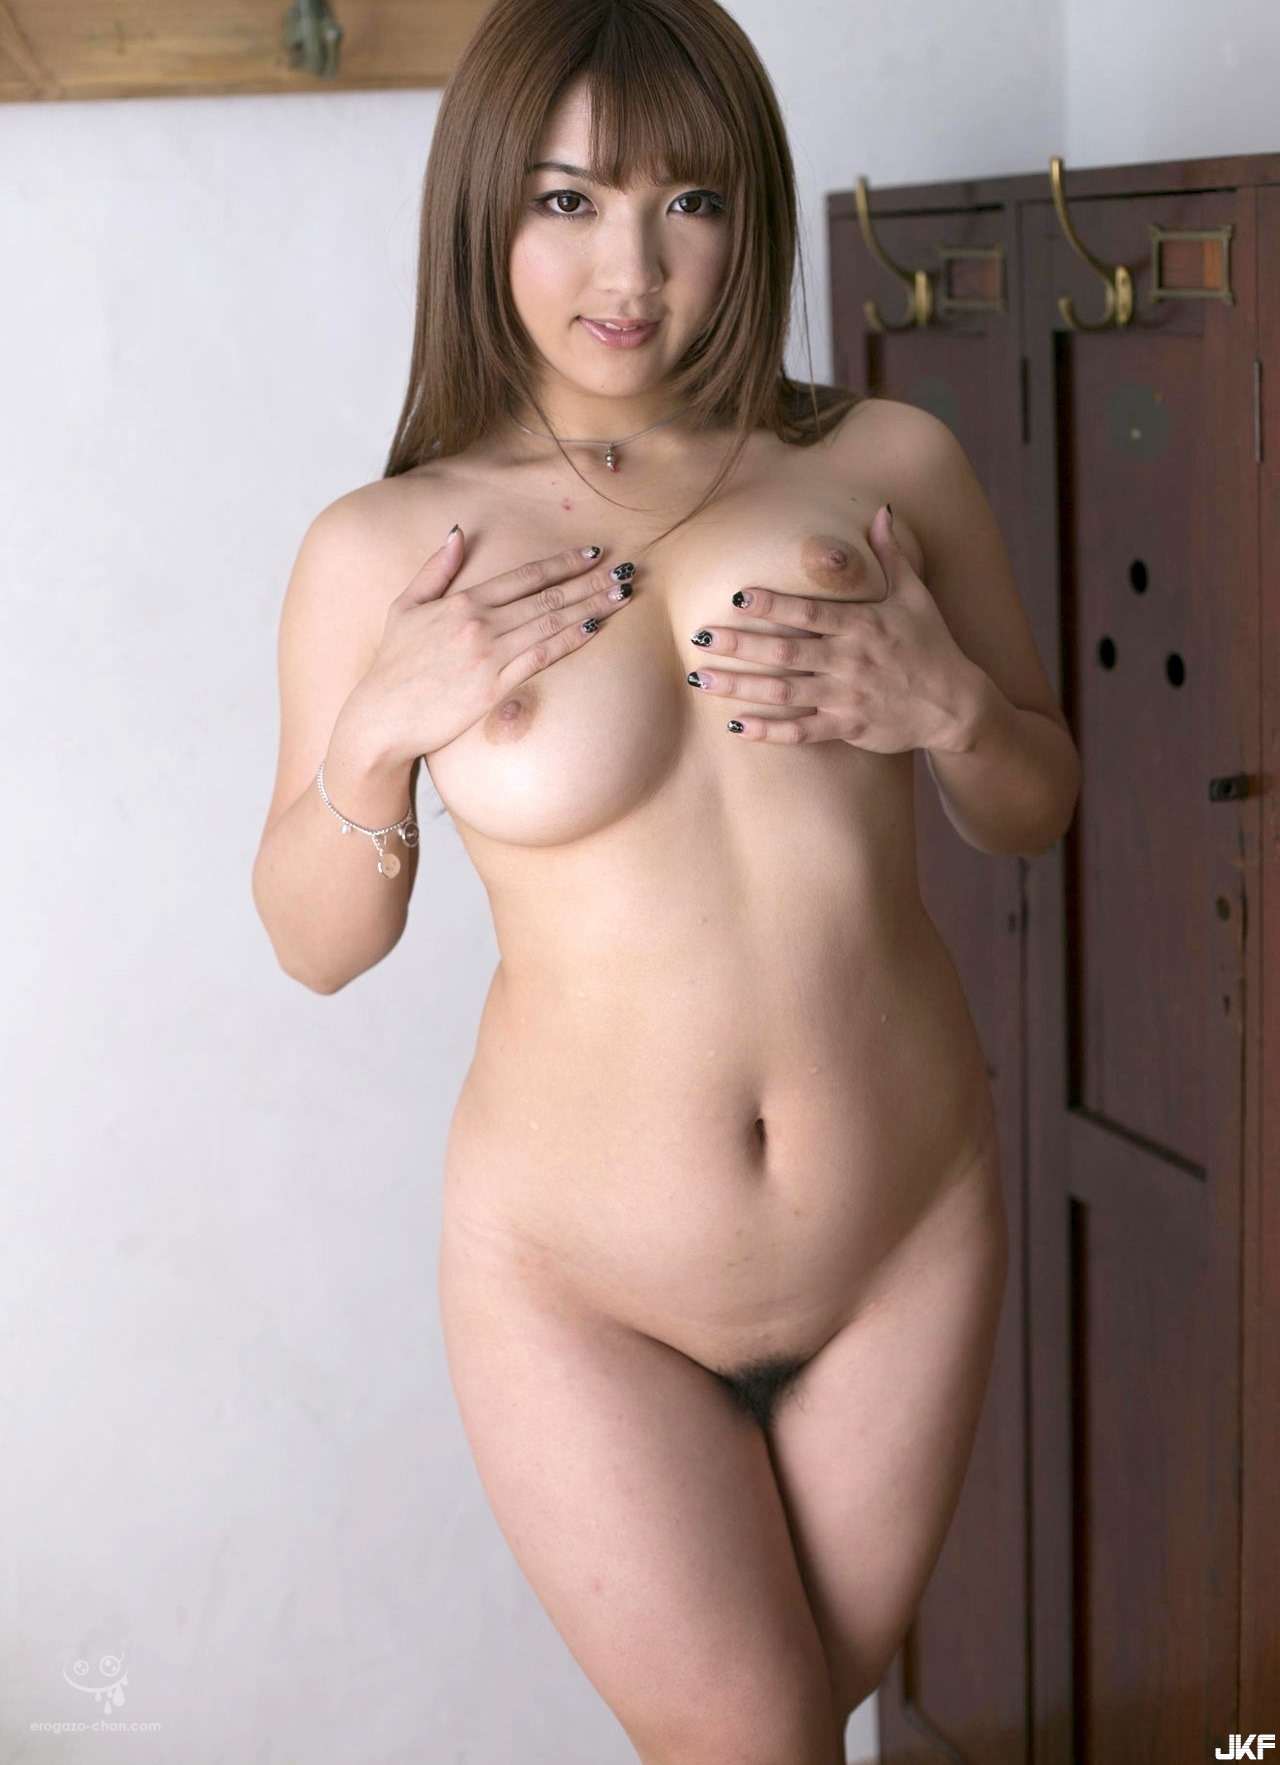 kamisaki_shiori_633-148.jpg